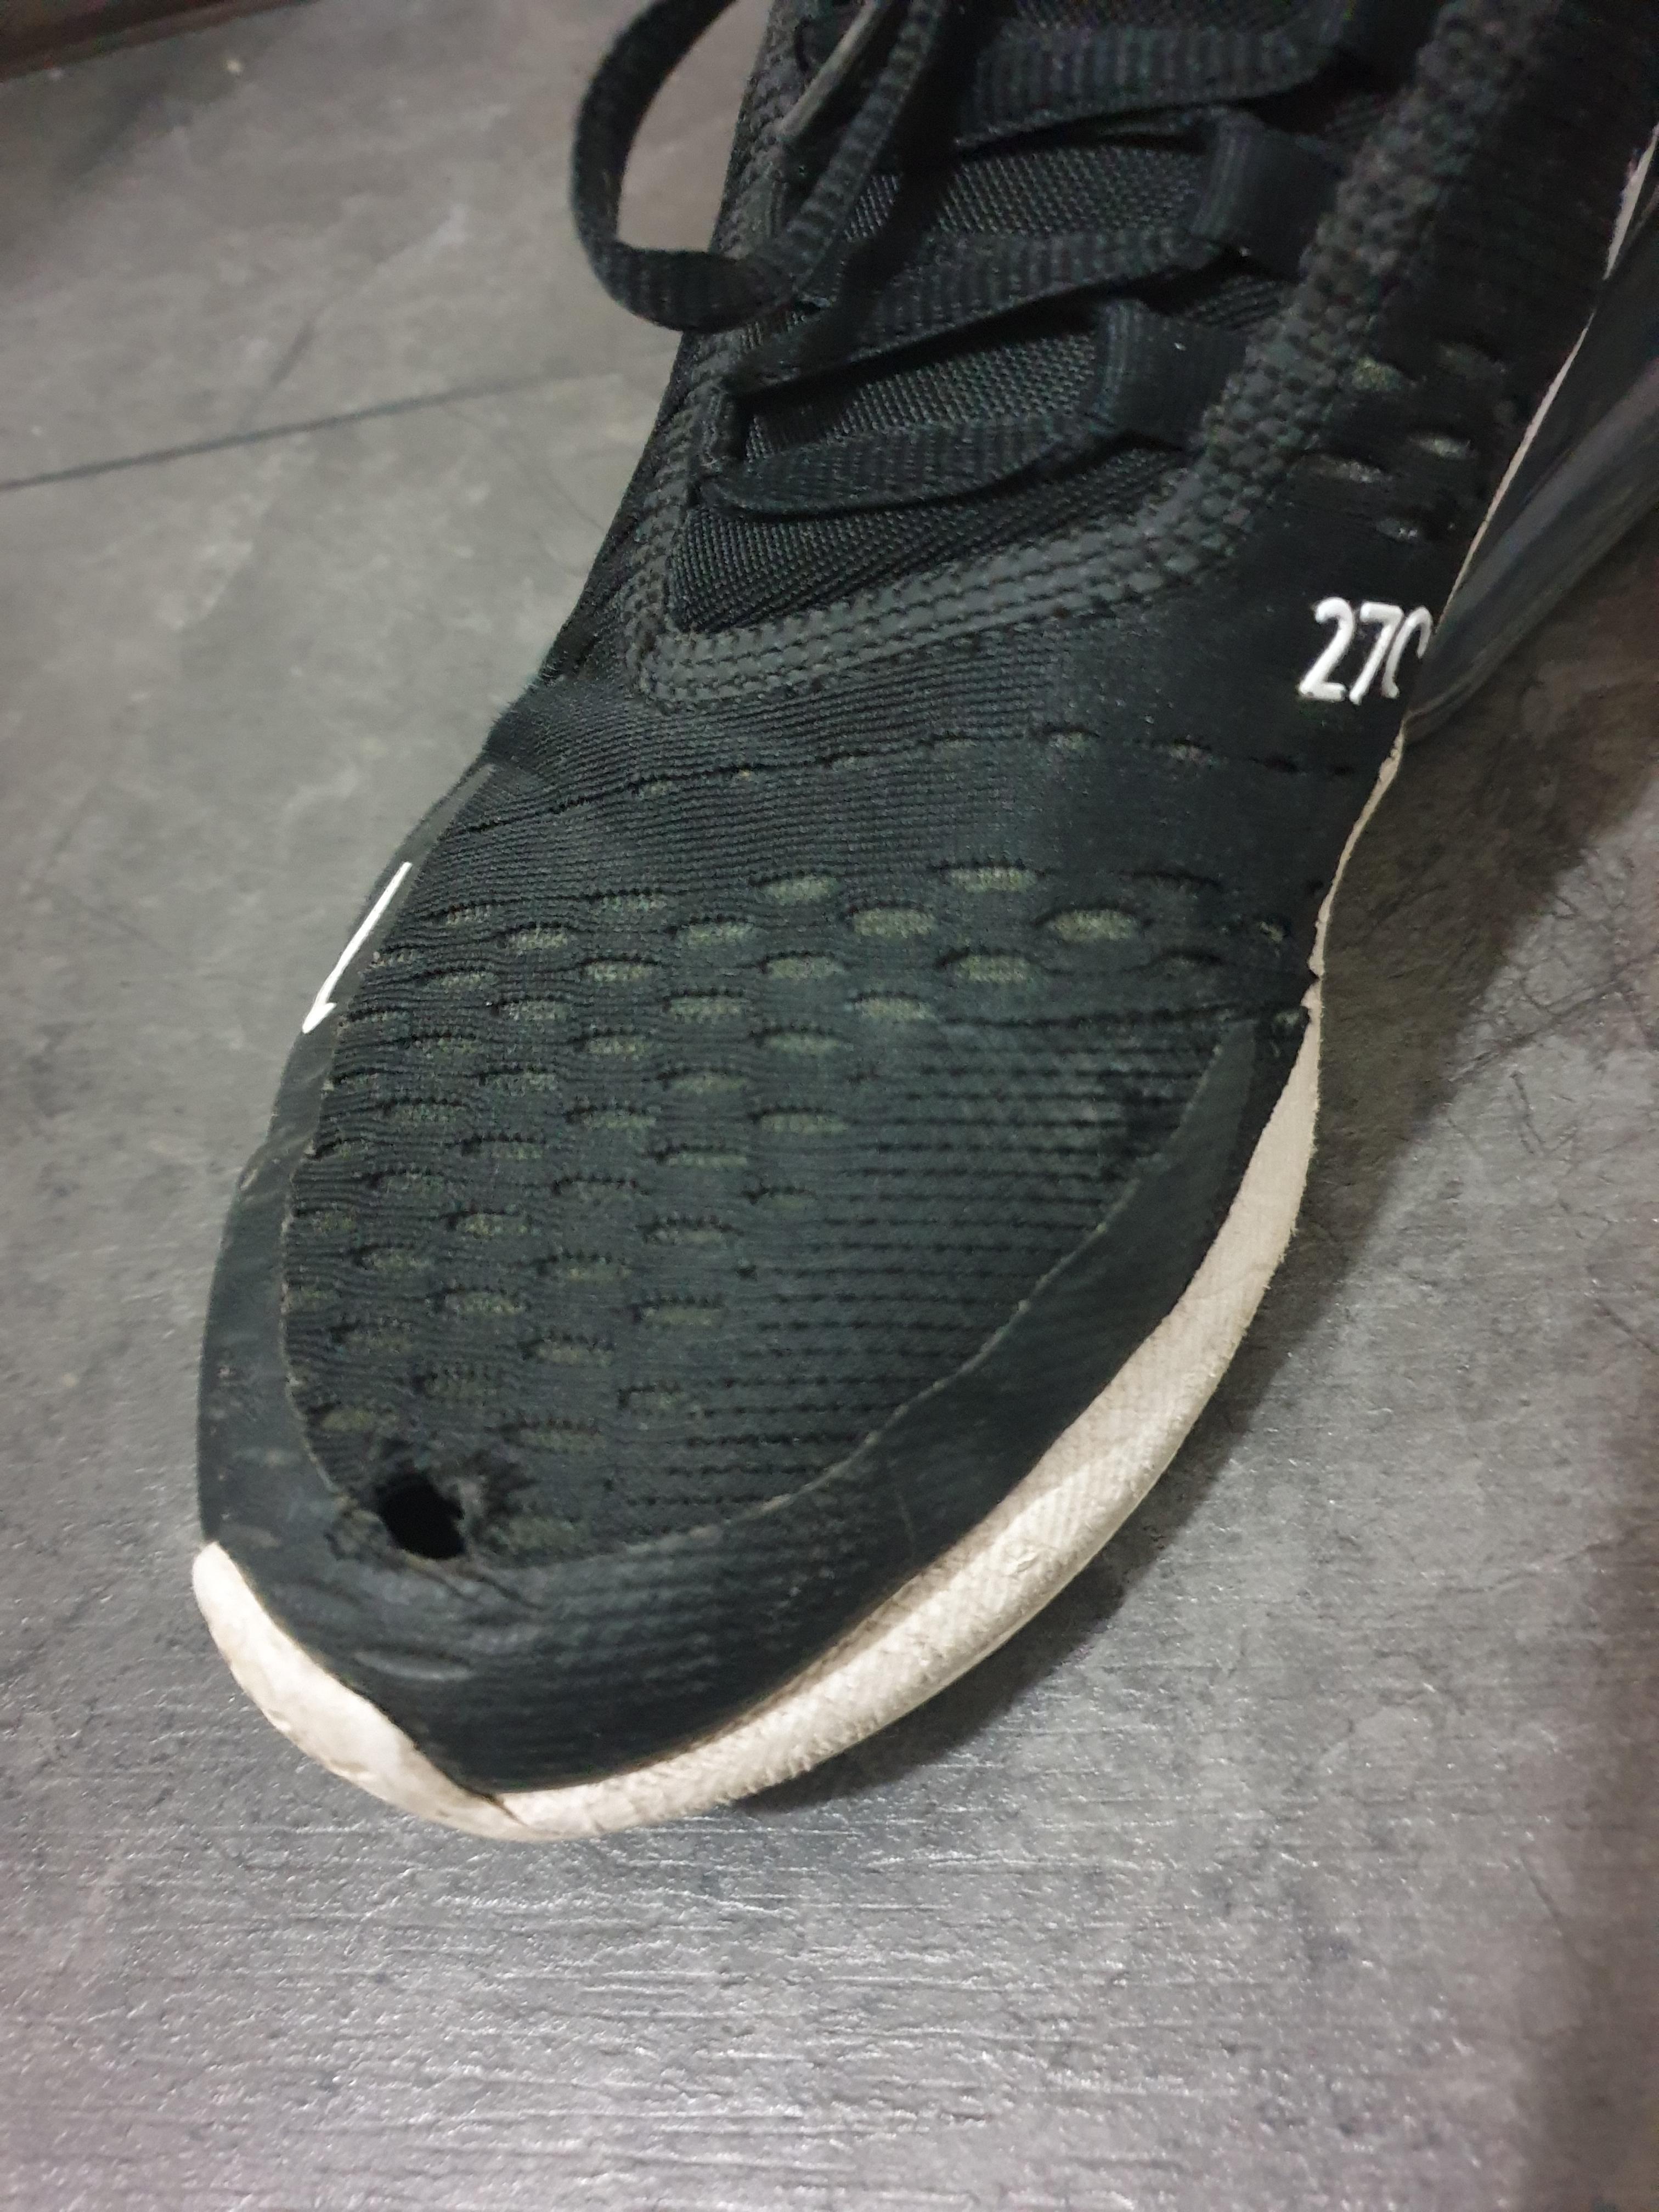 Nike Air Max 270 schlechte Qualität; Erfahrungen? (Schuhe)